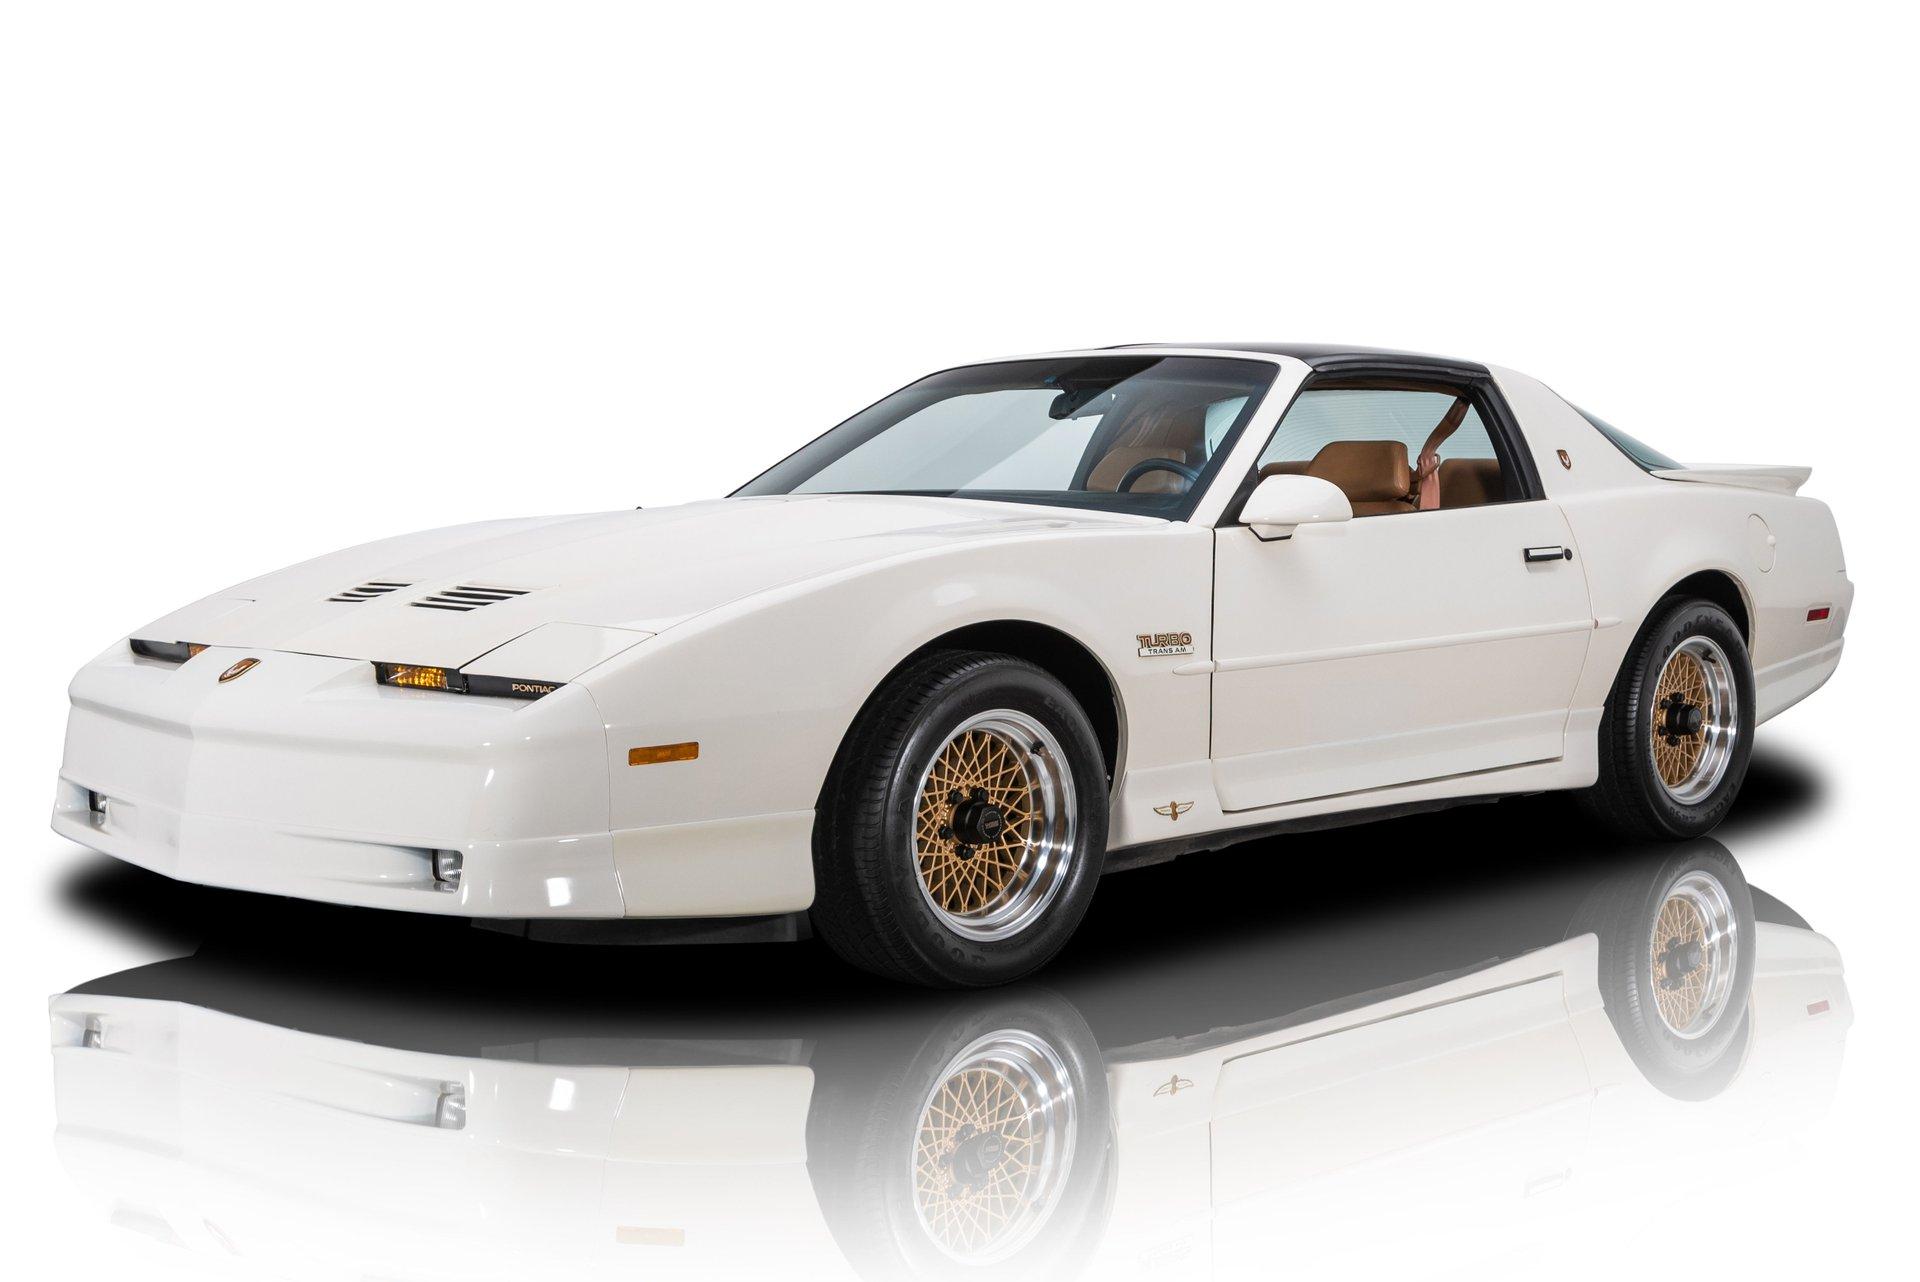 1989 pontiac firebird trans am turbo pace car